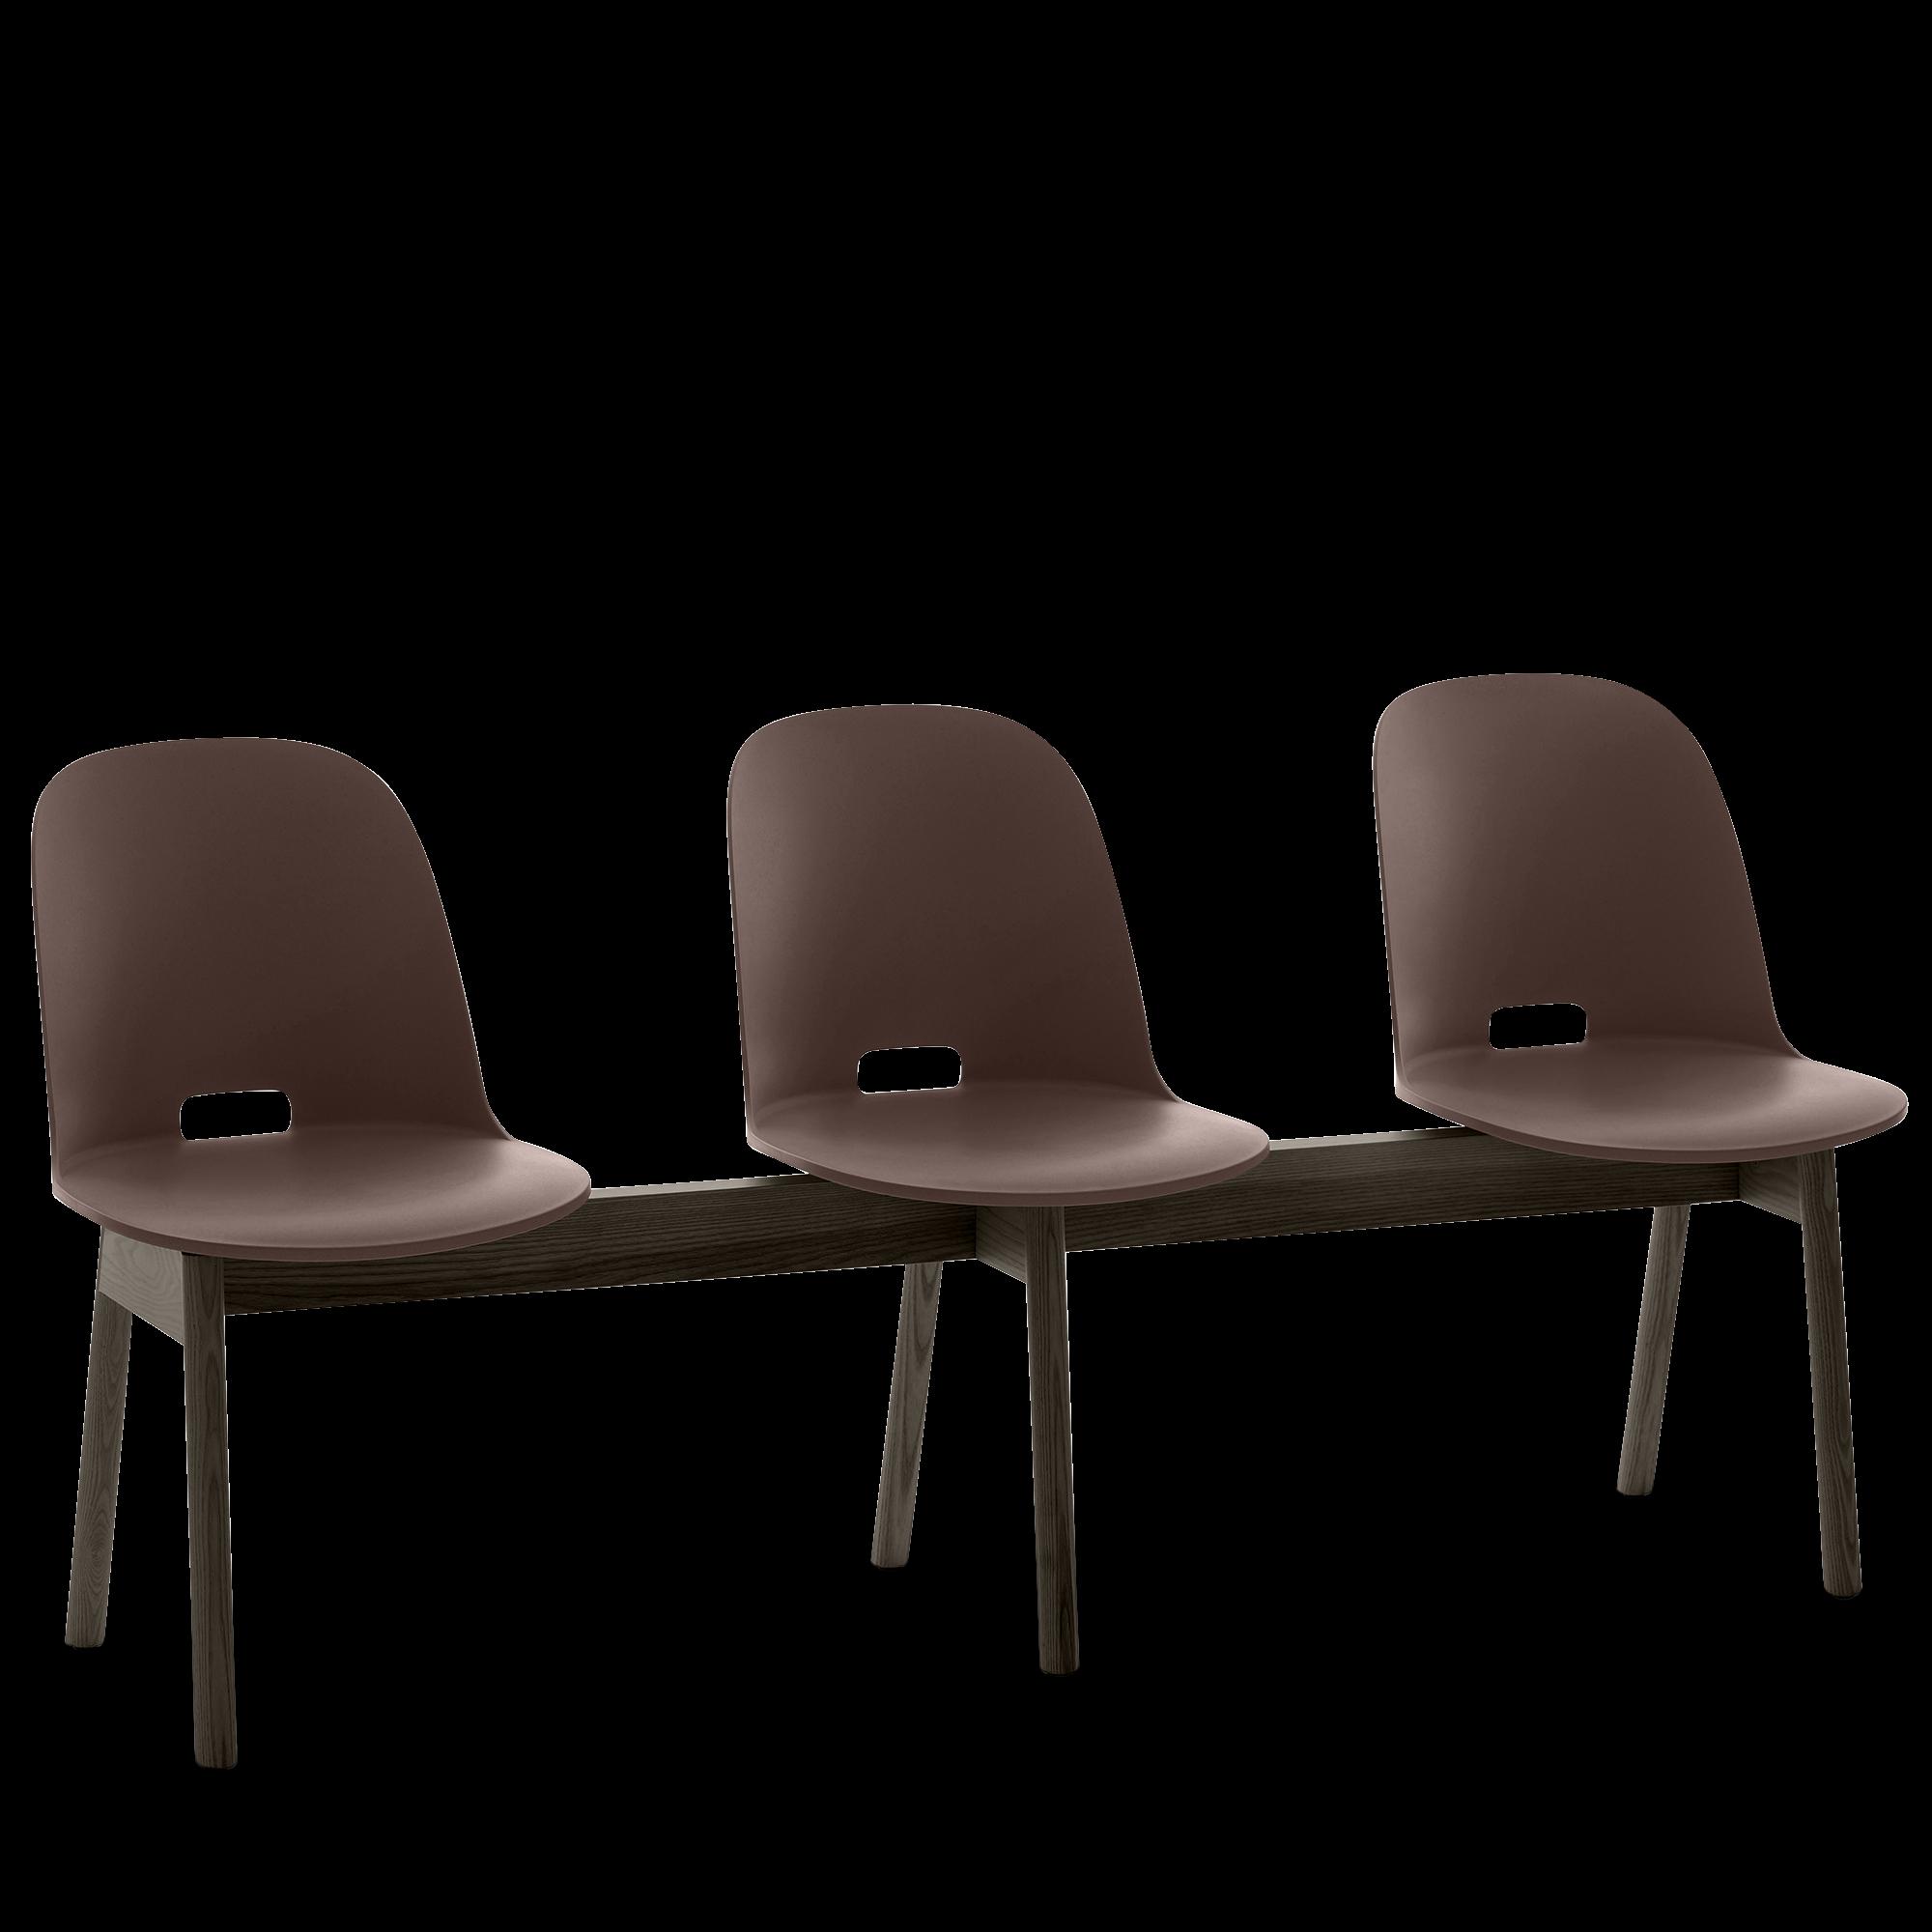 alfi-3-seat-bench-high-back